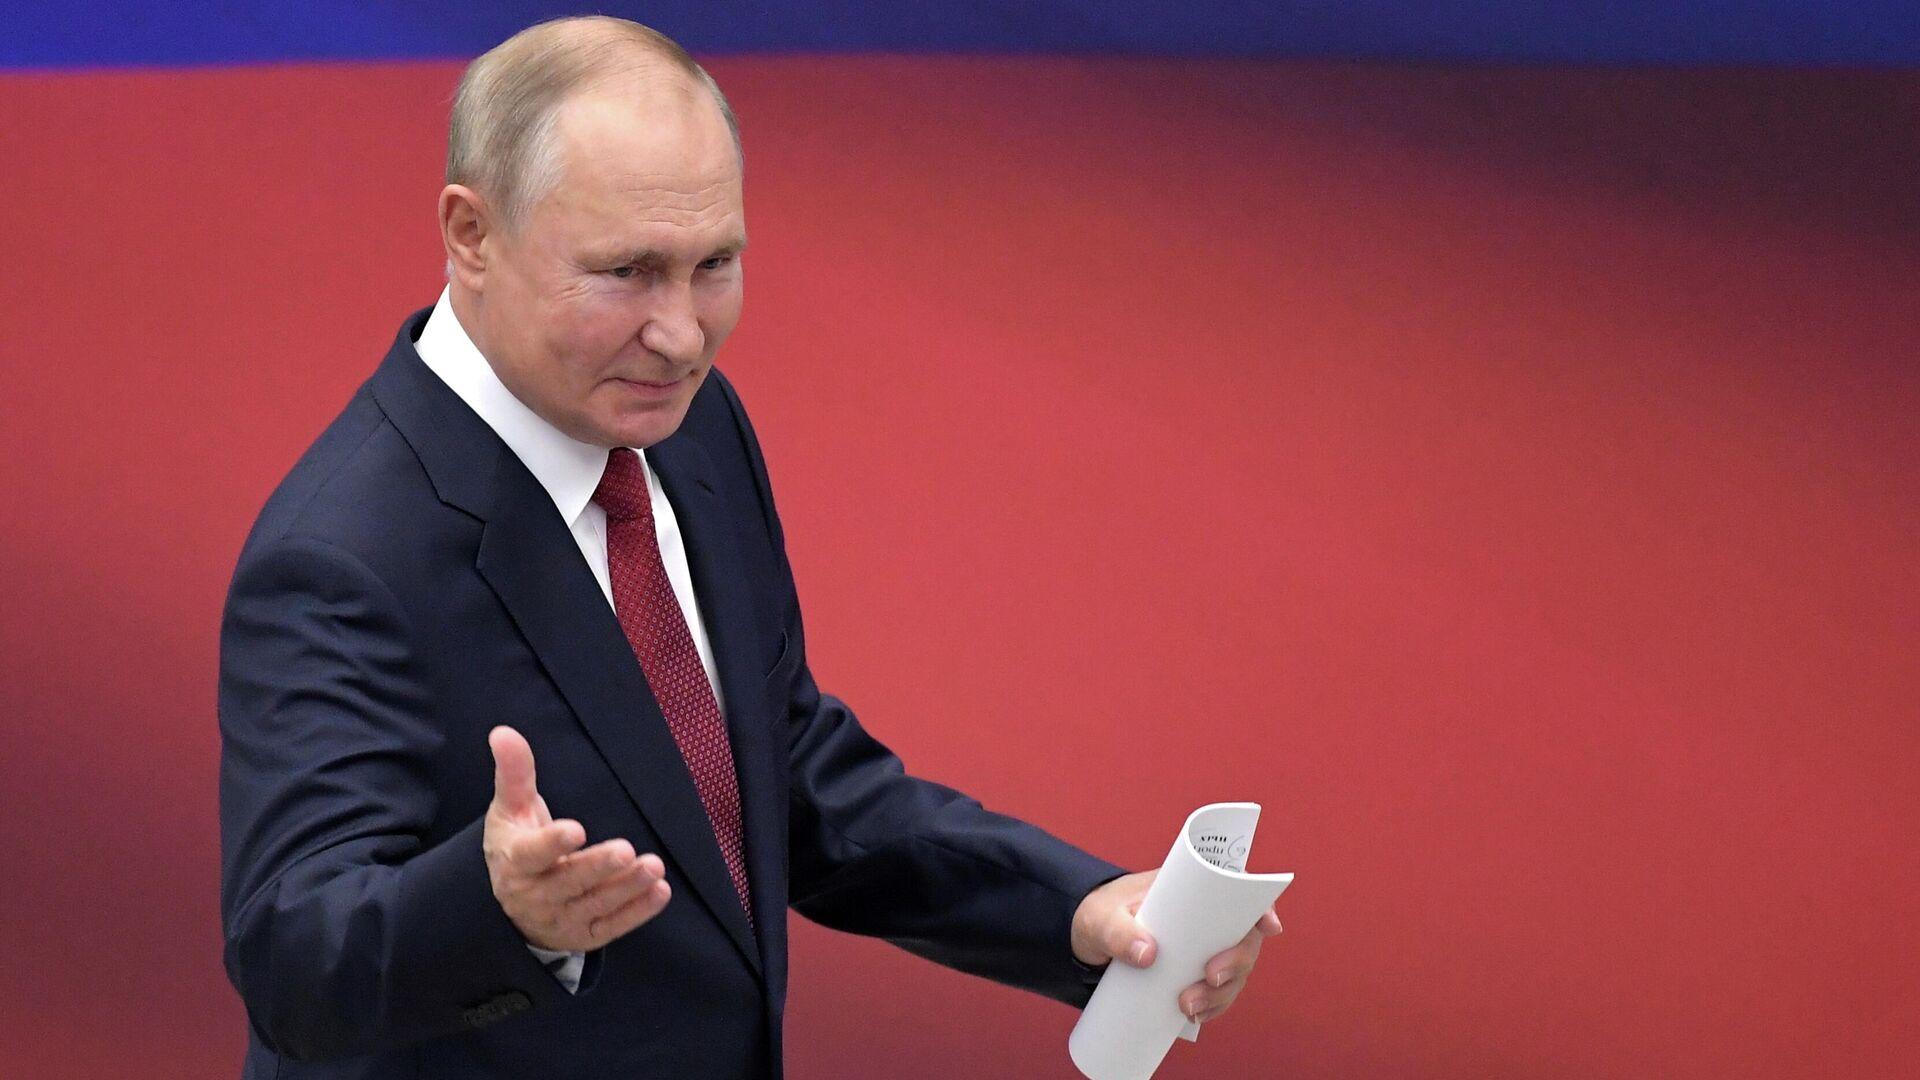 Президент России Владимир Путин - Sputnik Узбекистан, 1920, 01.09.2021